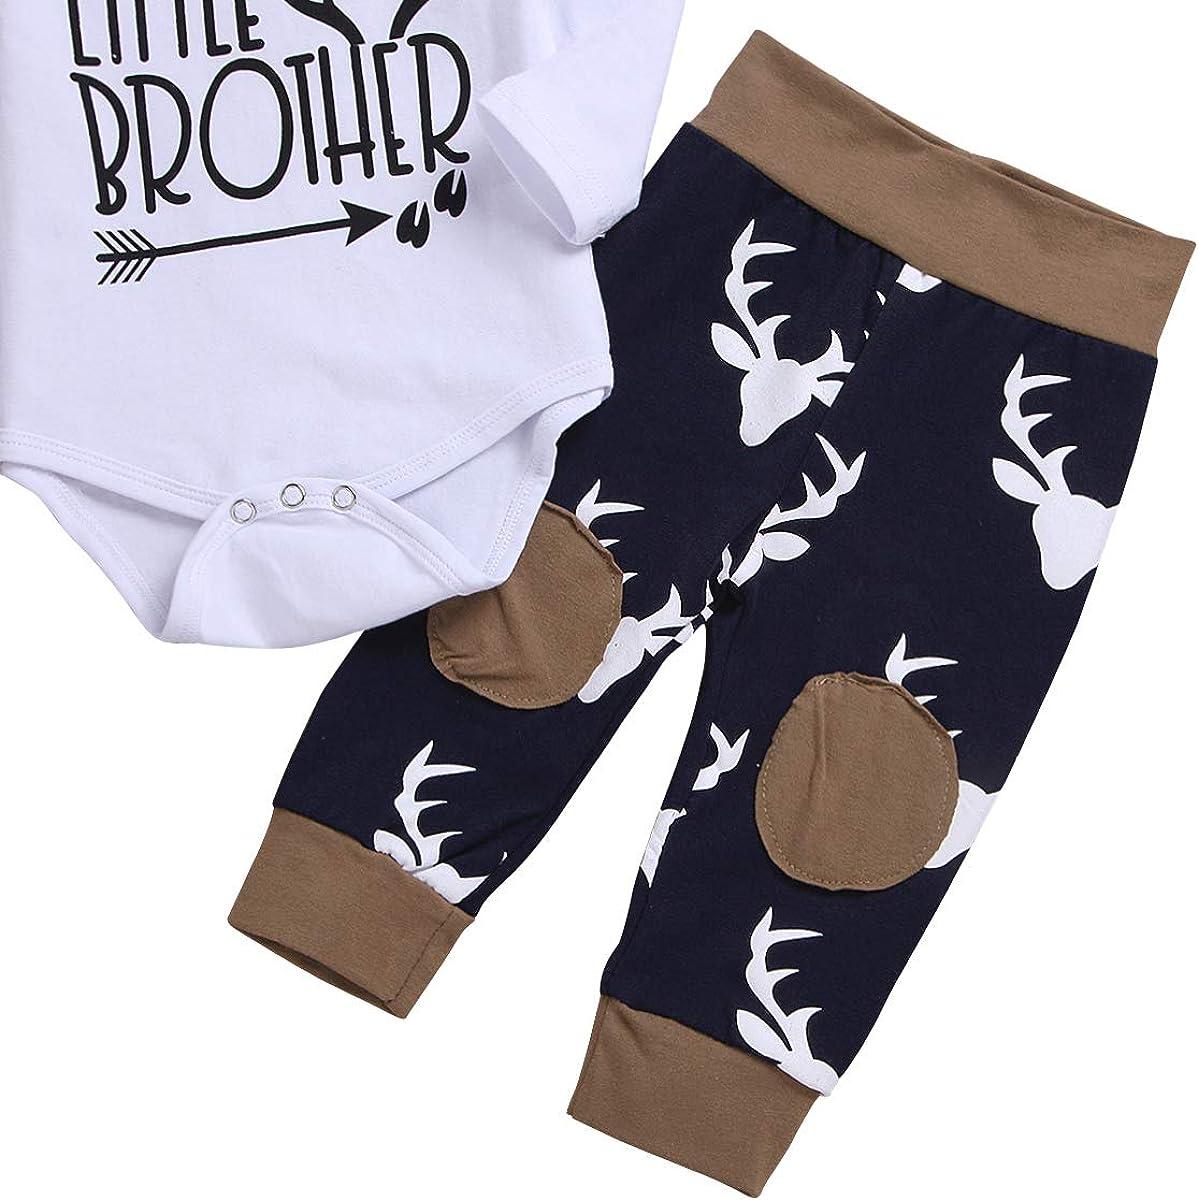 Edjude Newborn Baby Boys Clothing Sets Long Sleeve Outfit Romper Jumpsuit Pants Sets 3Pcs Hat 0-18 Months